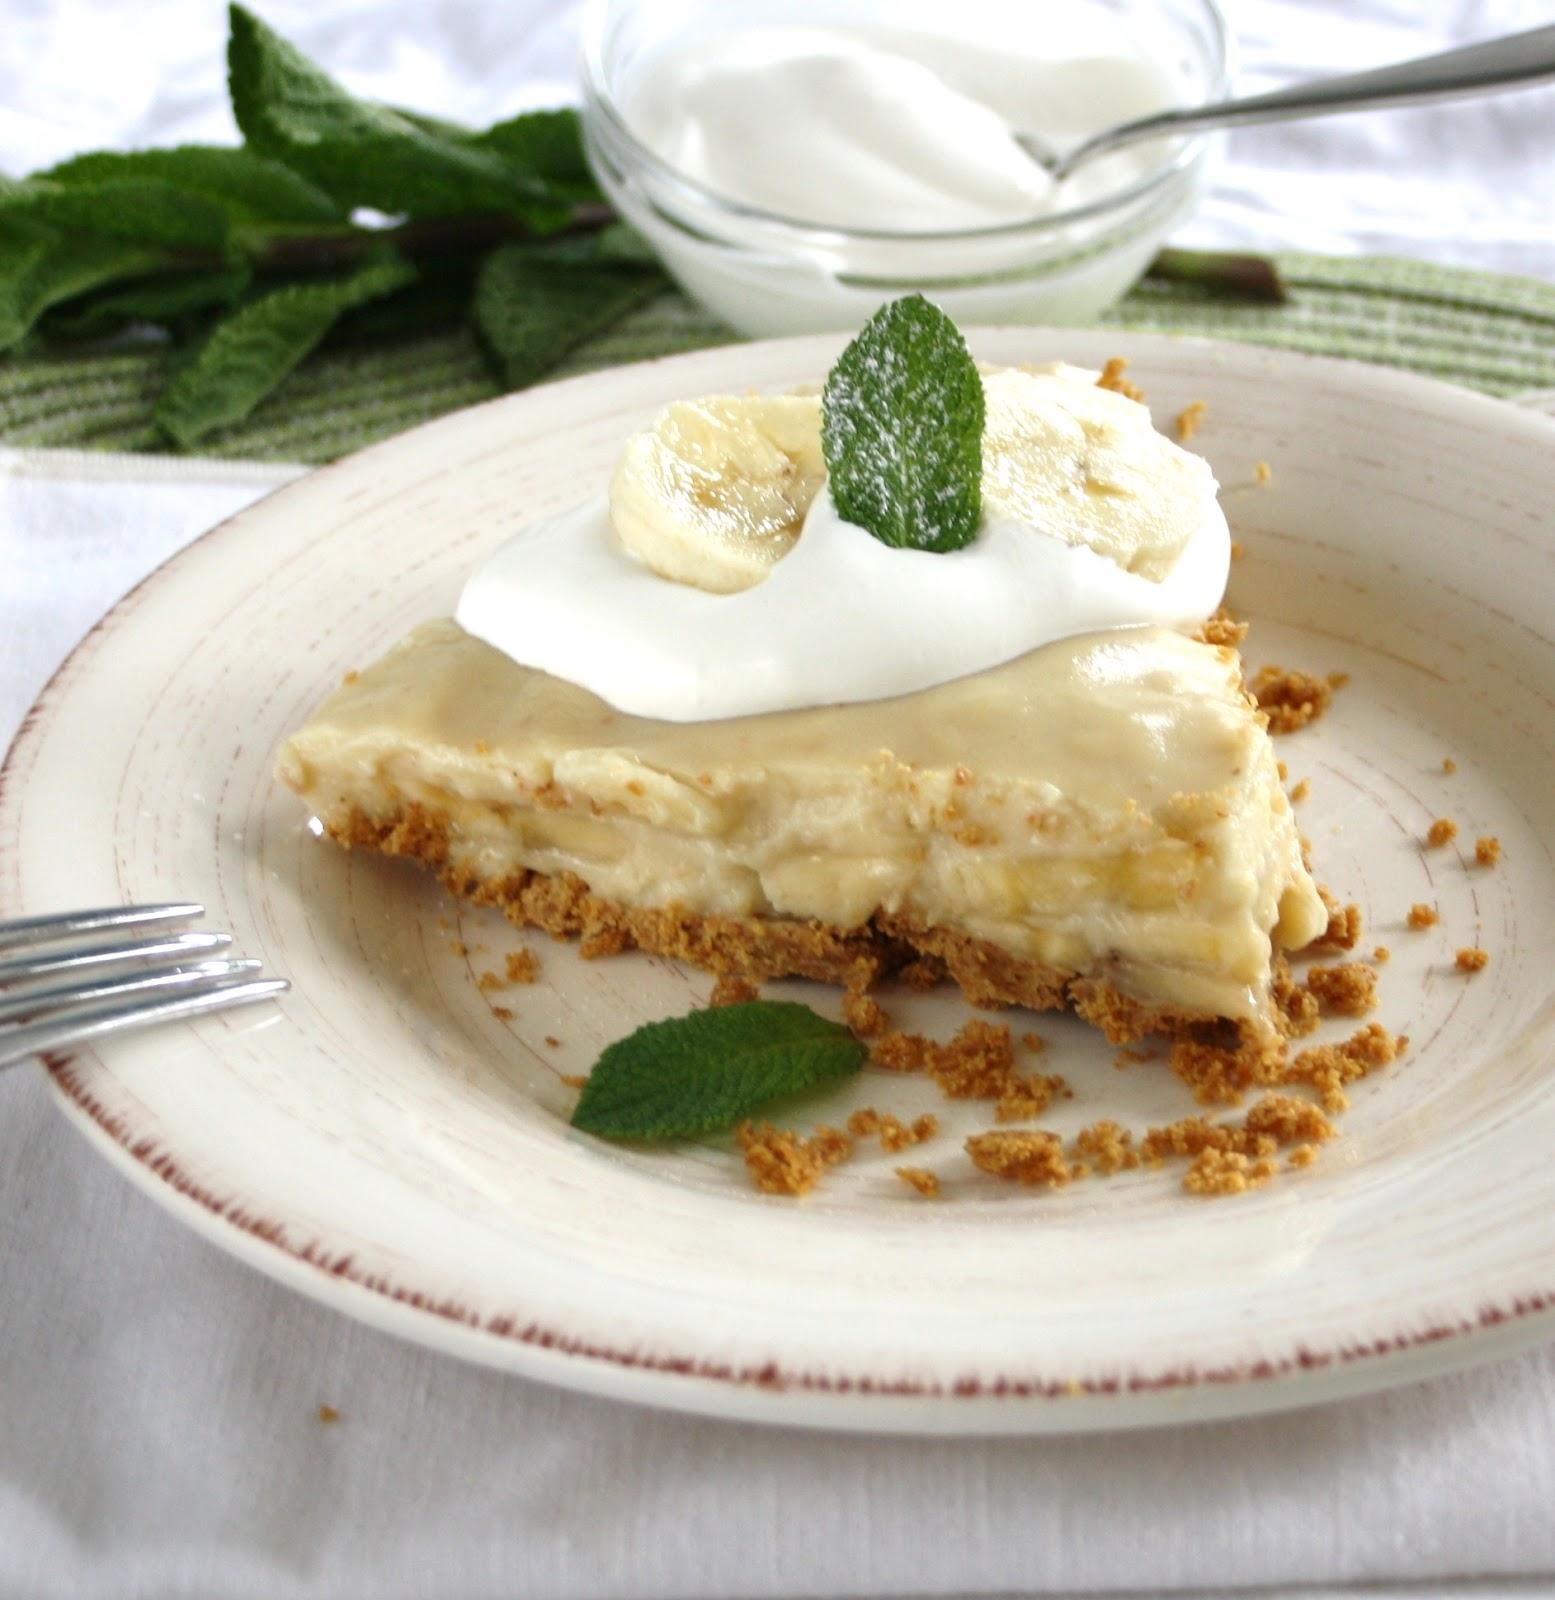 Vanilla Infused Banana Cream Pie with a Whole Grain Graham Crust